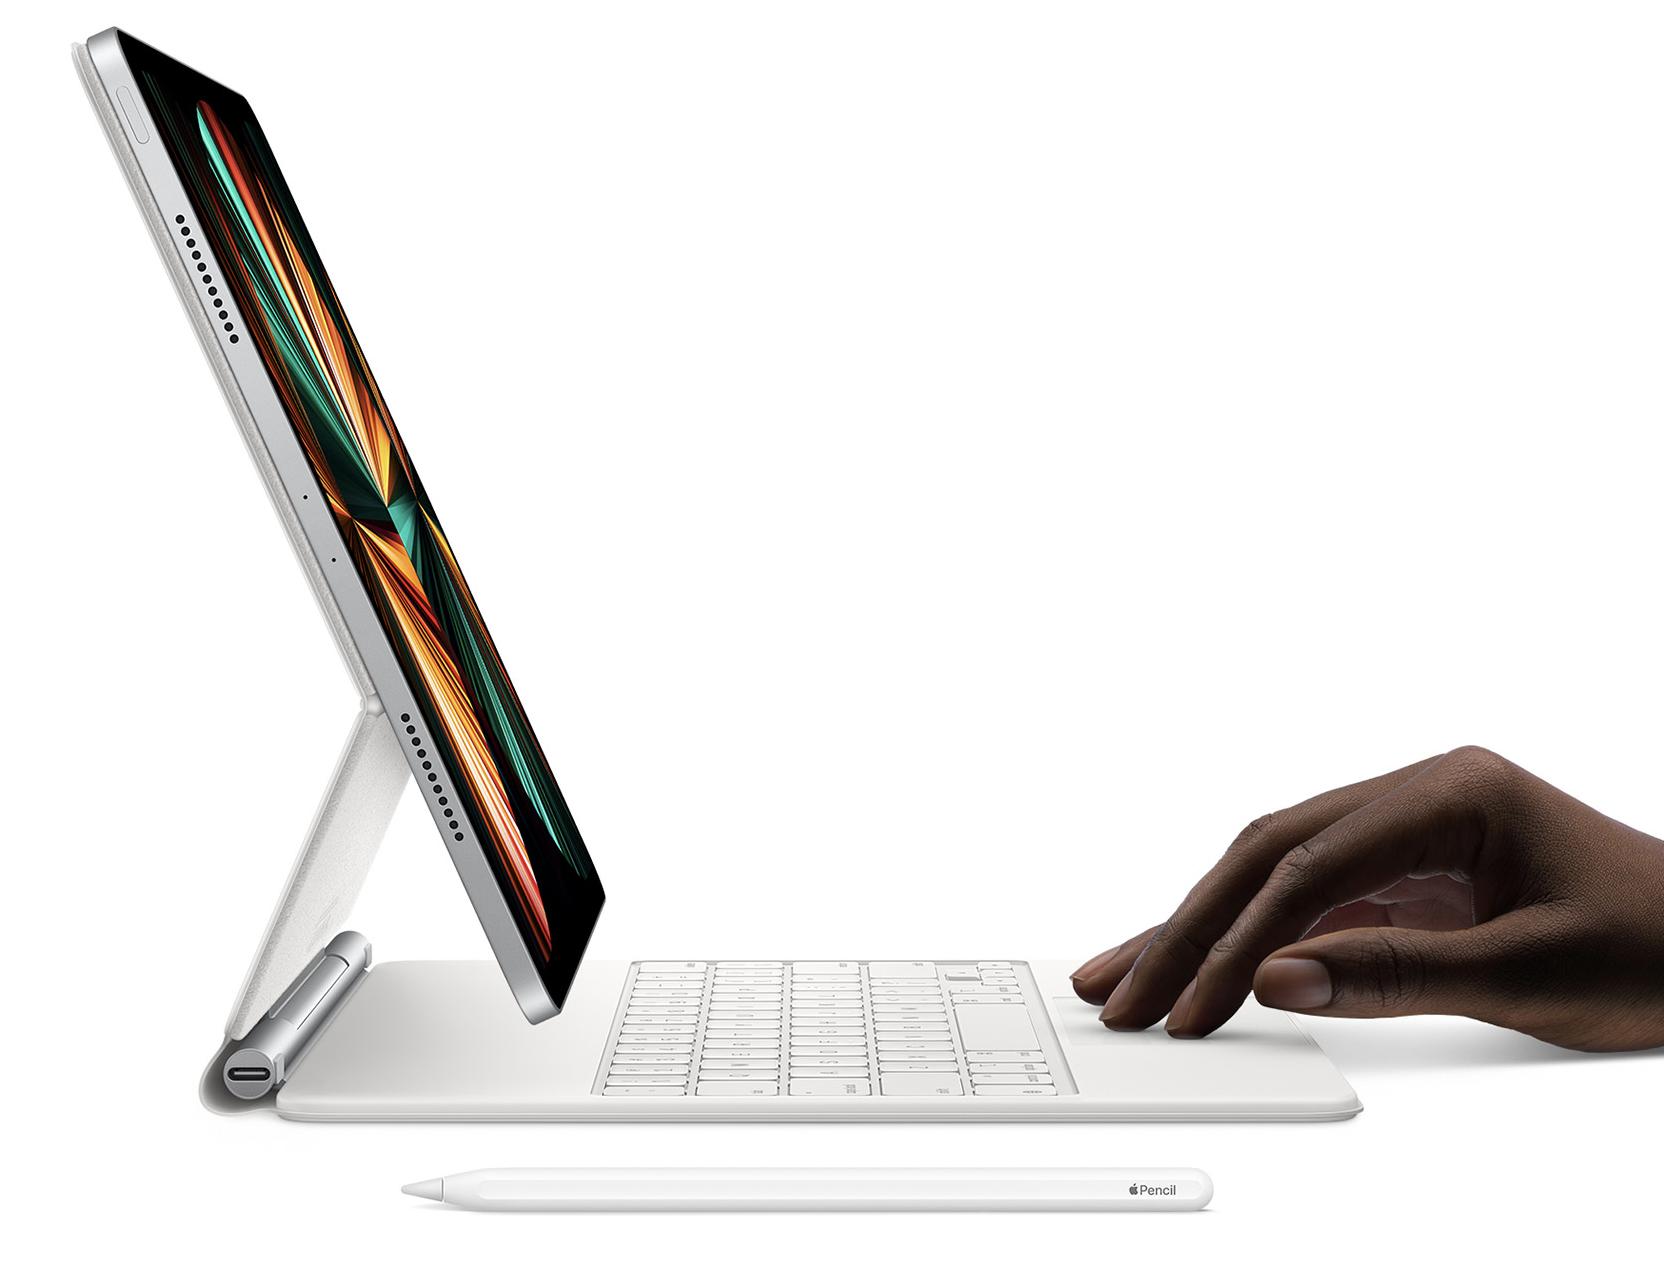 iPad Pro in a white Magic Keyboard case